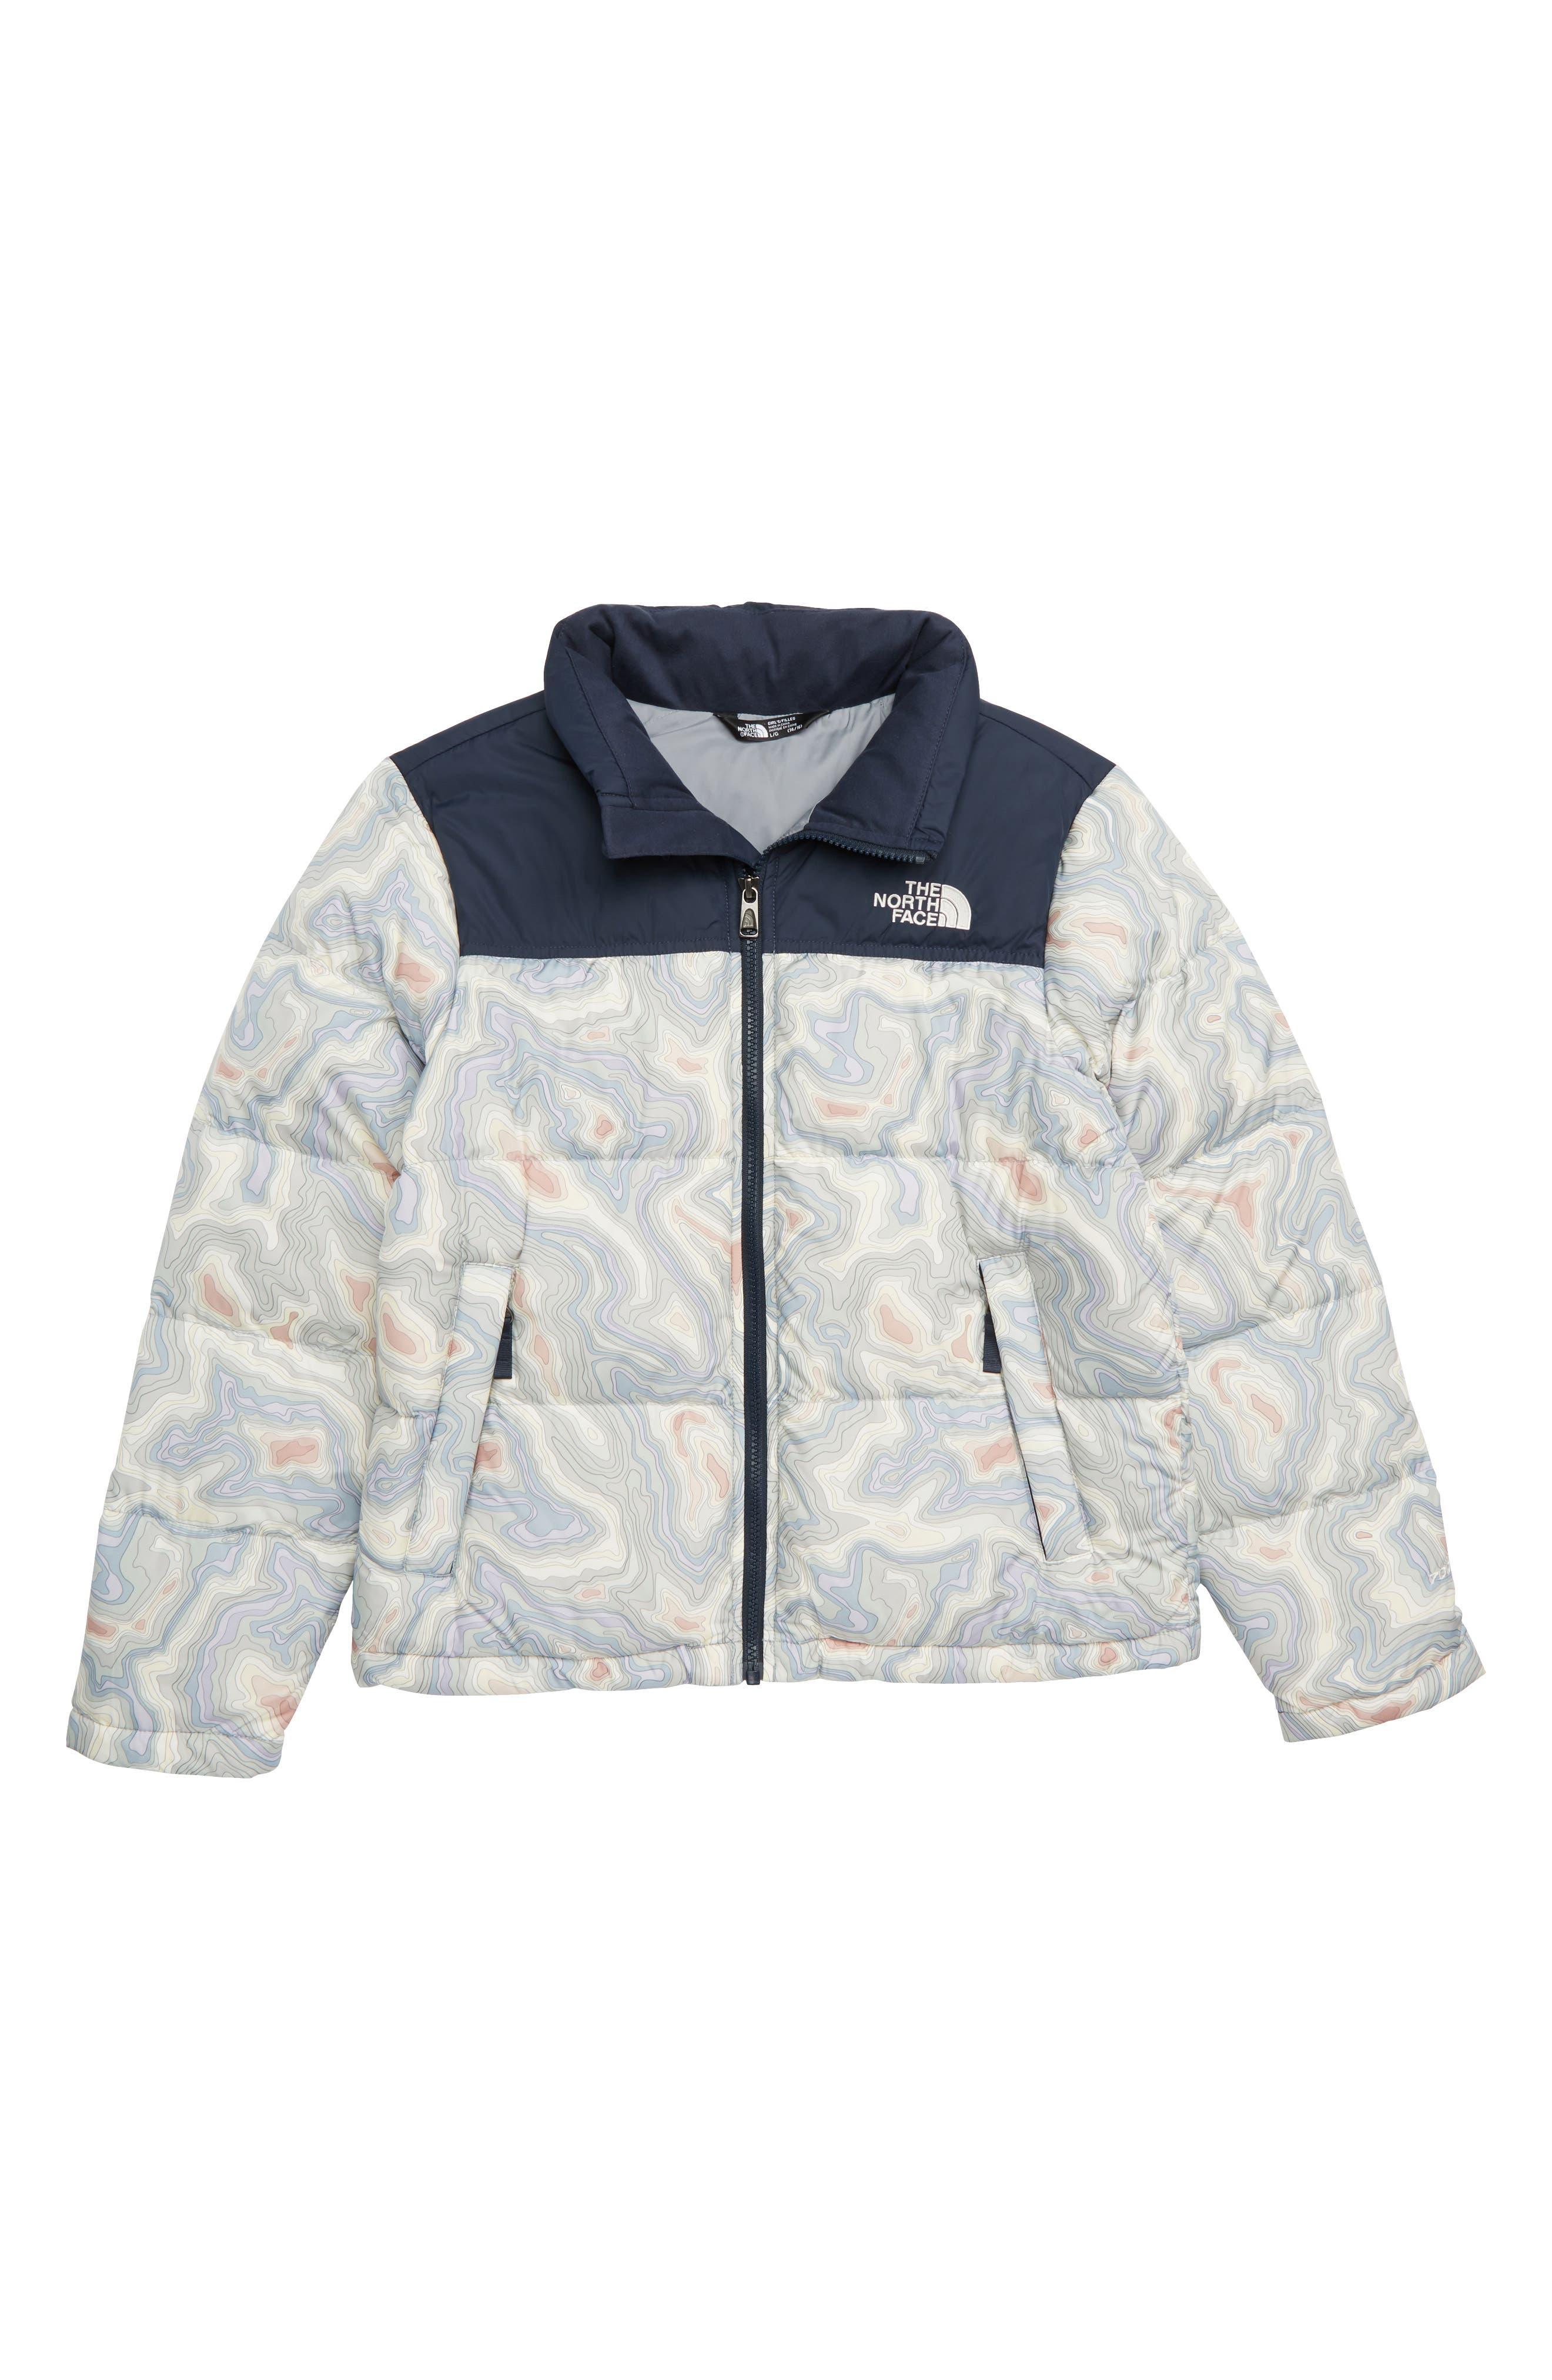 Nuptse 700 Fill Power Down Puffer Jacket,                         Main,                         color, MULTI TOPO PRINT